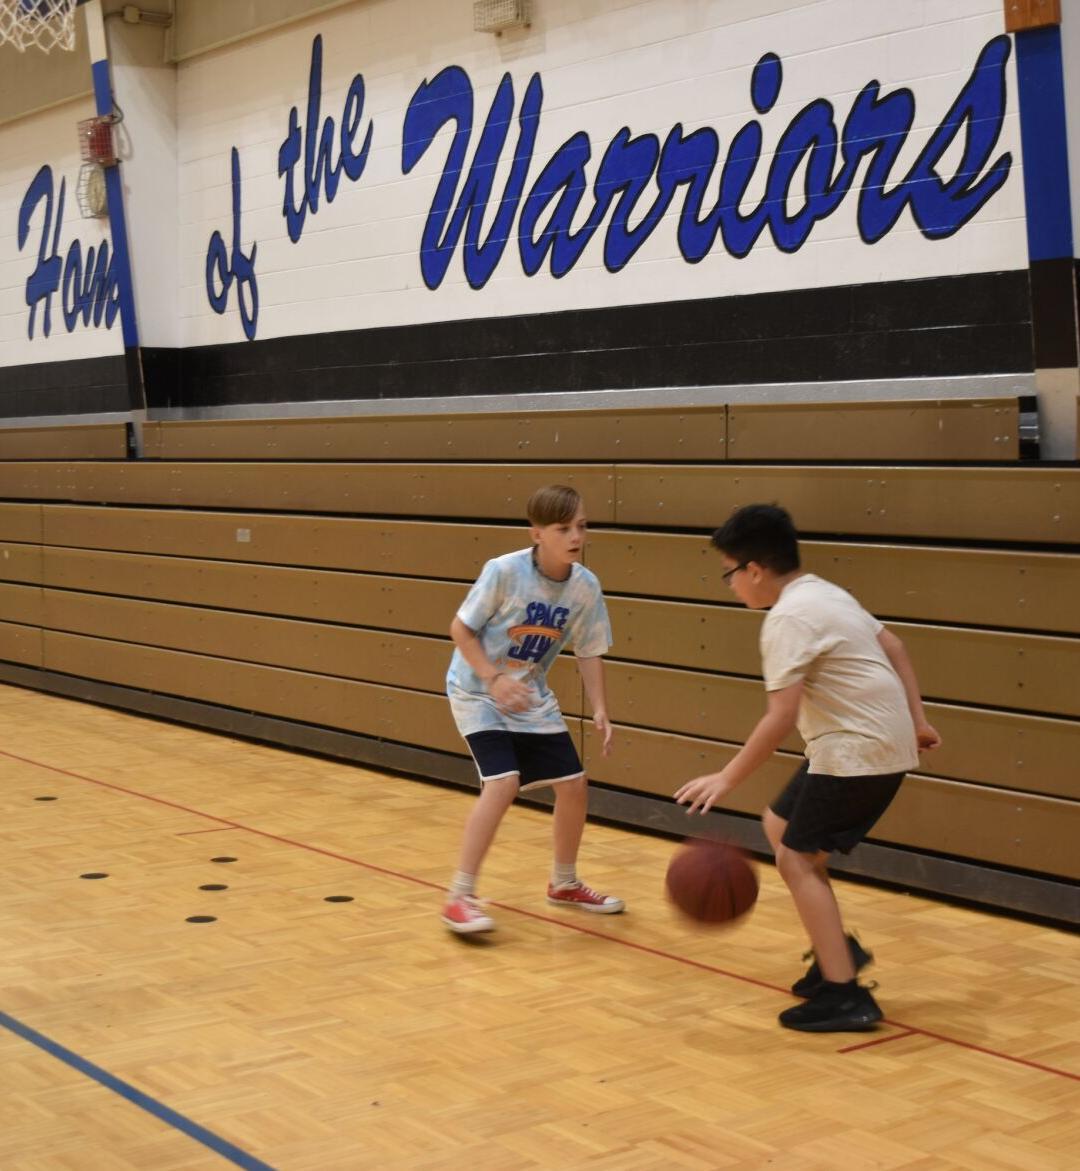 Ashworth Middle holds summer basketball camp